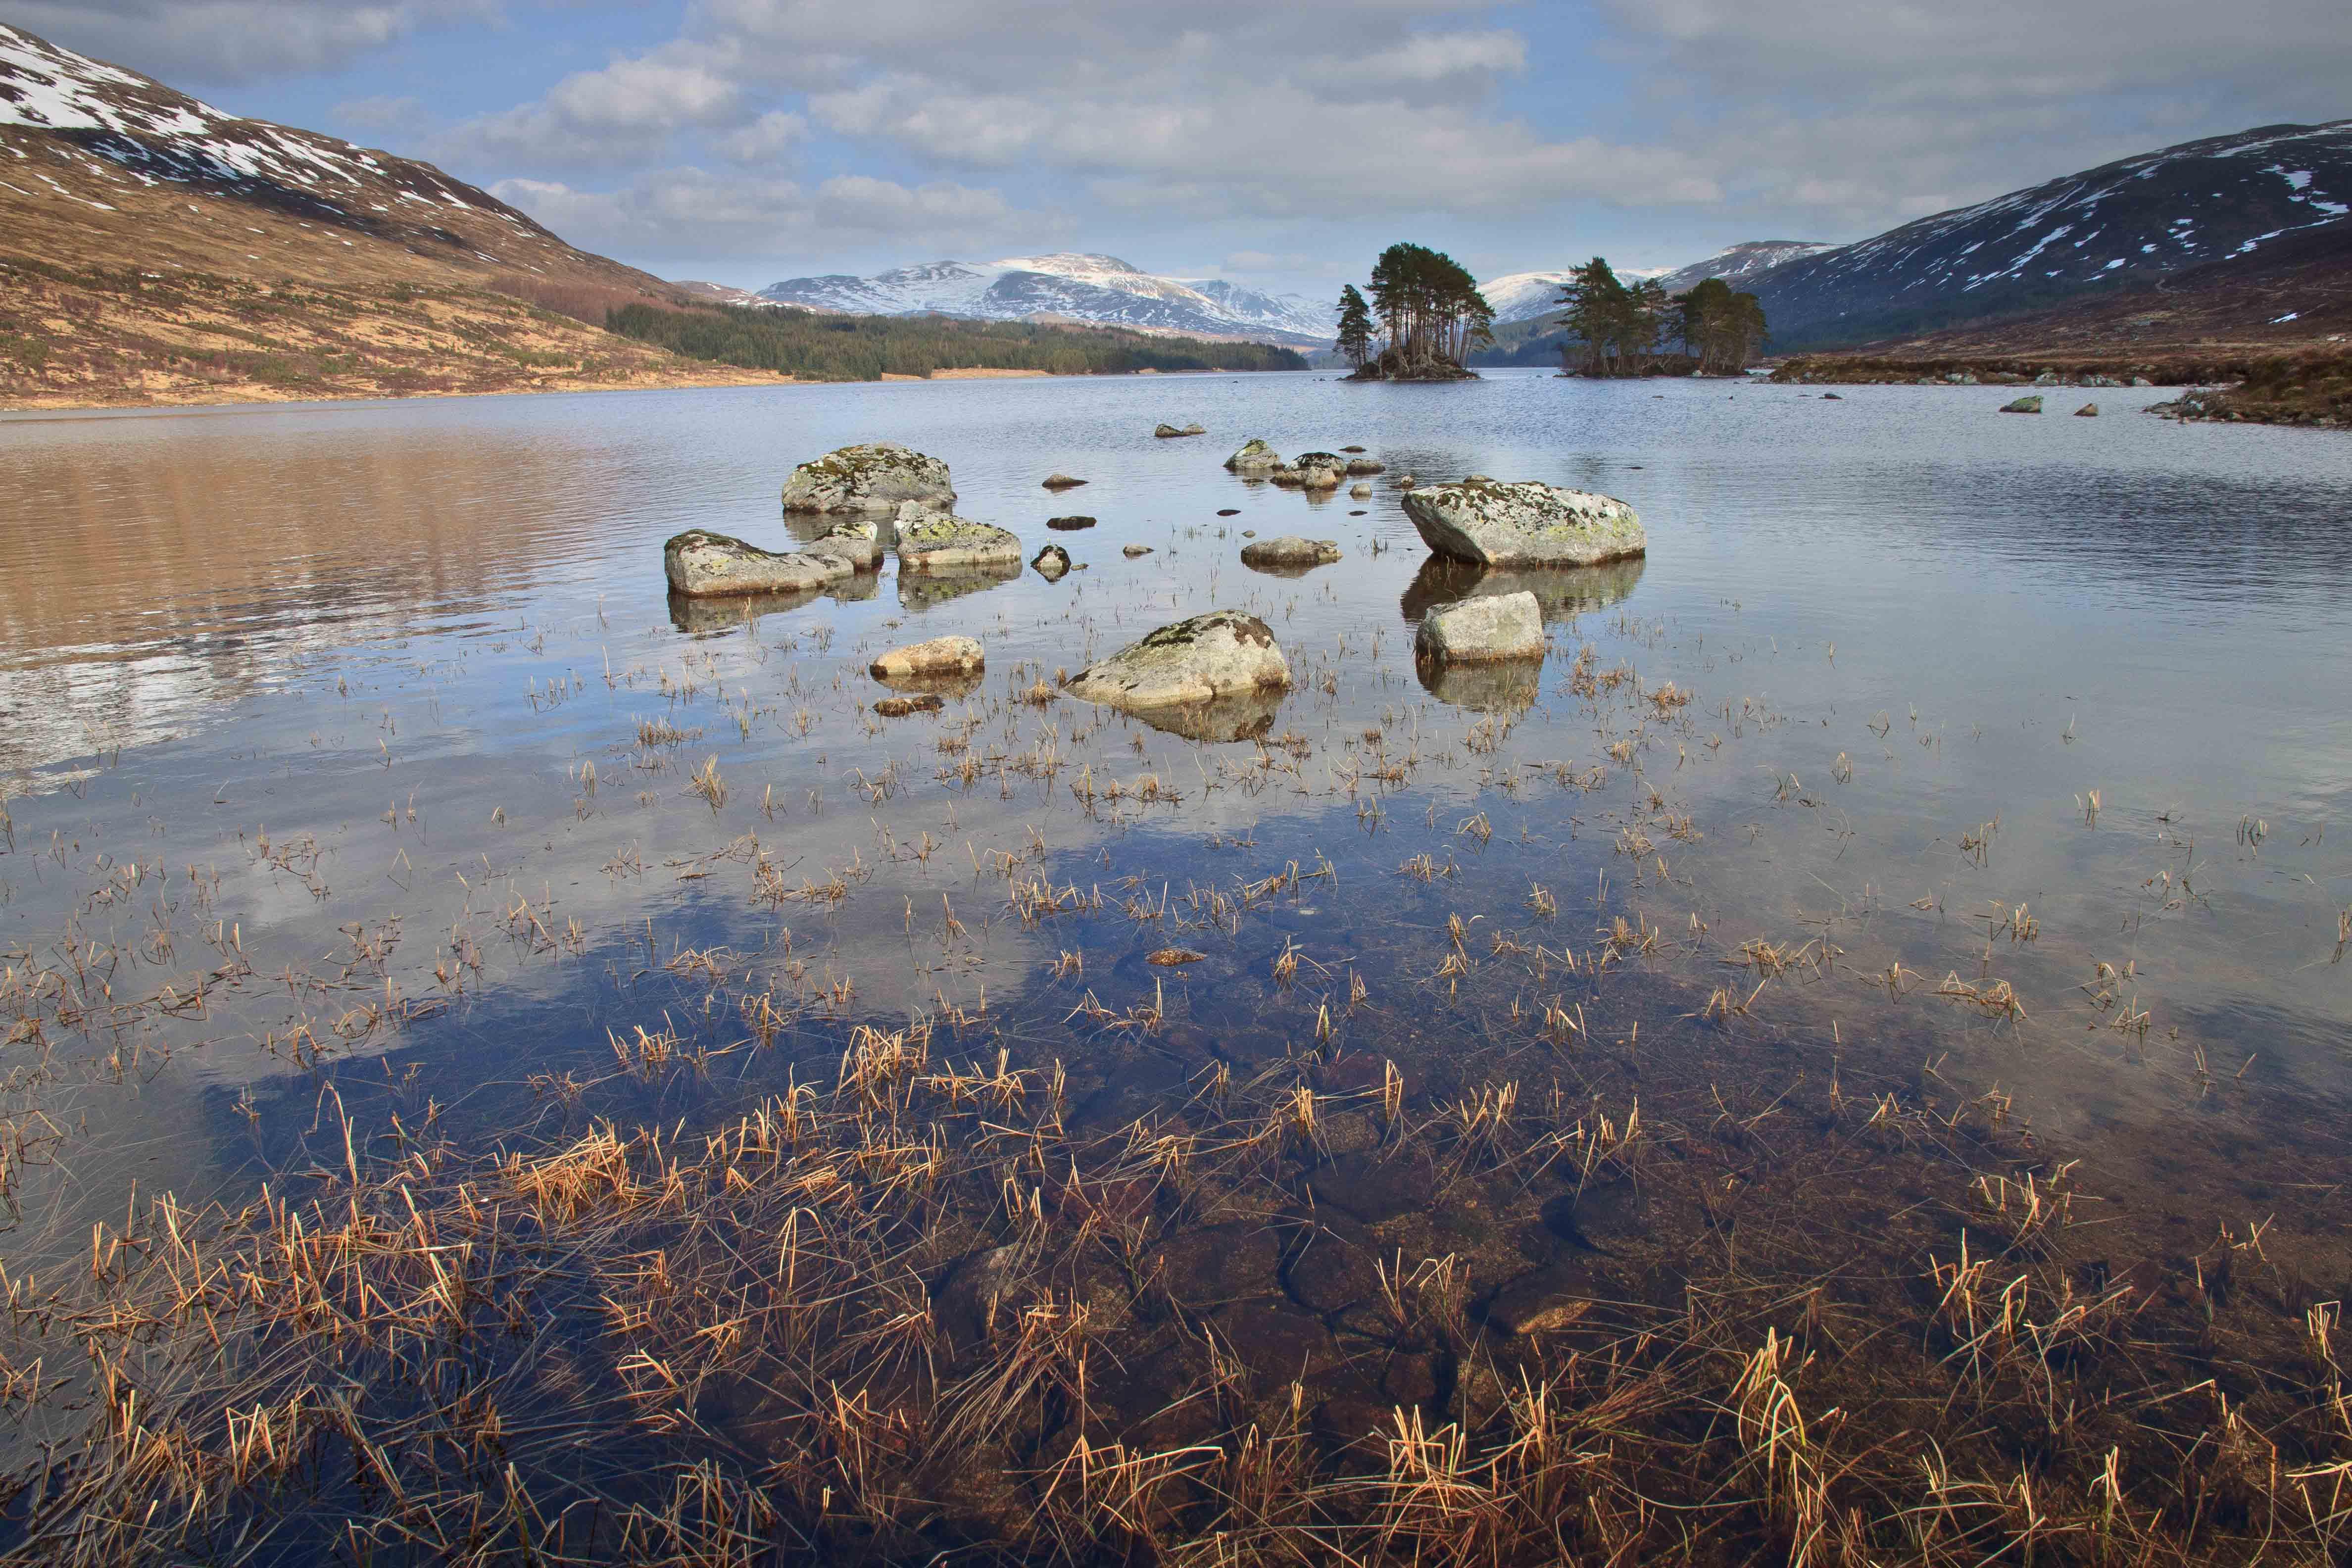 Loch Ossian from near the Youth Hostel looking east.